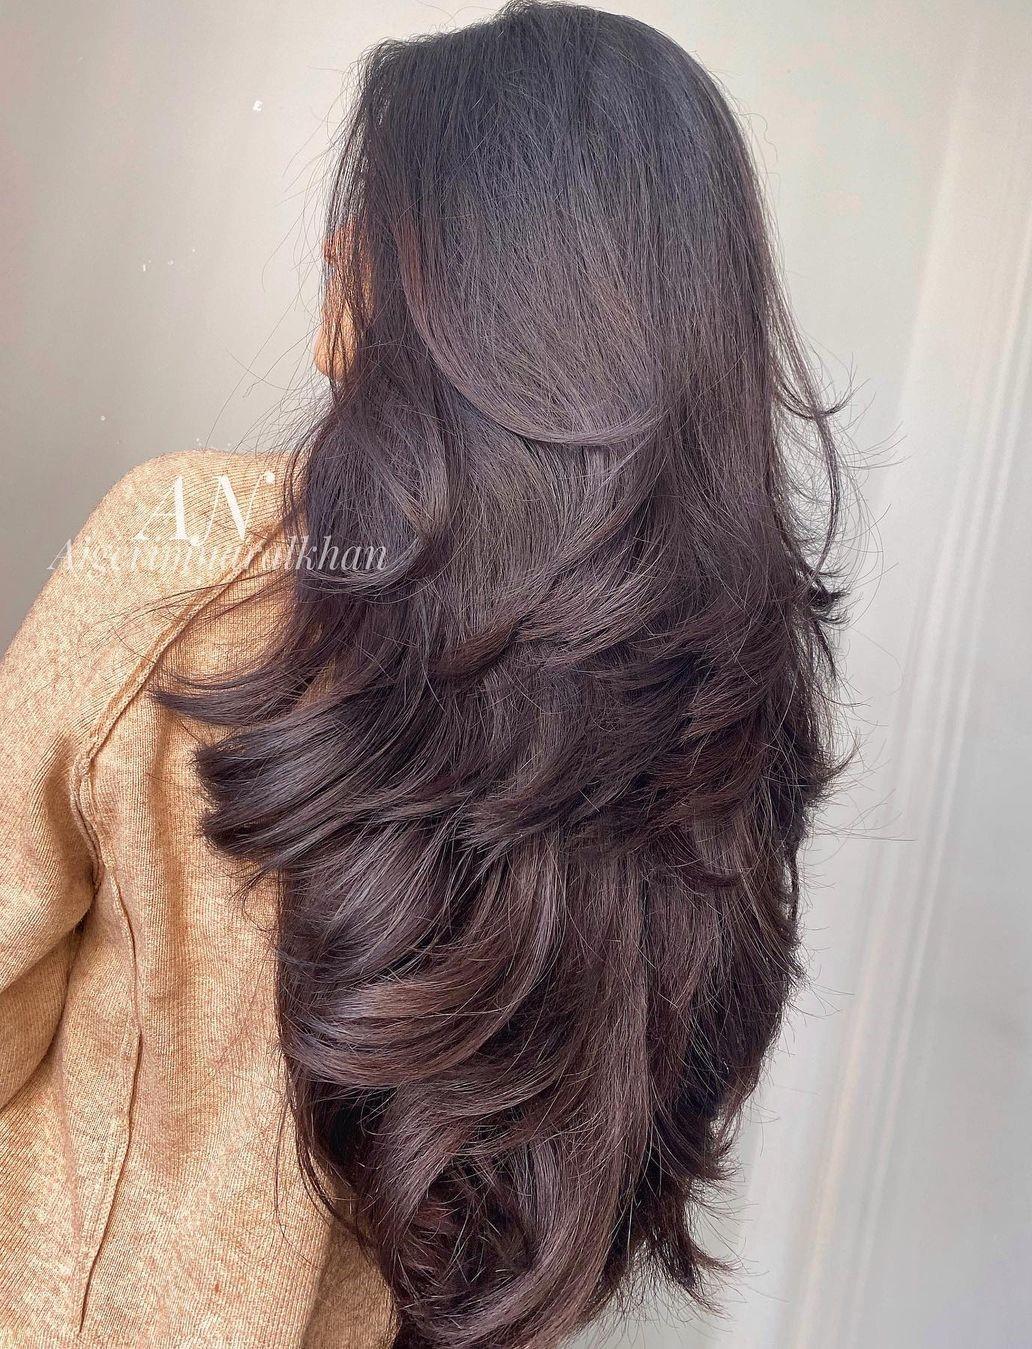 V Shape Cut for Long Thick Hair